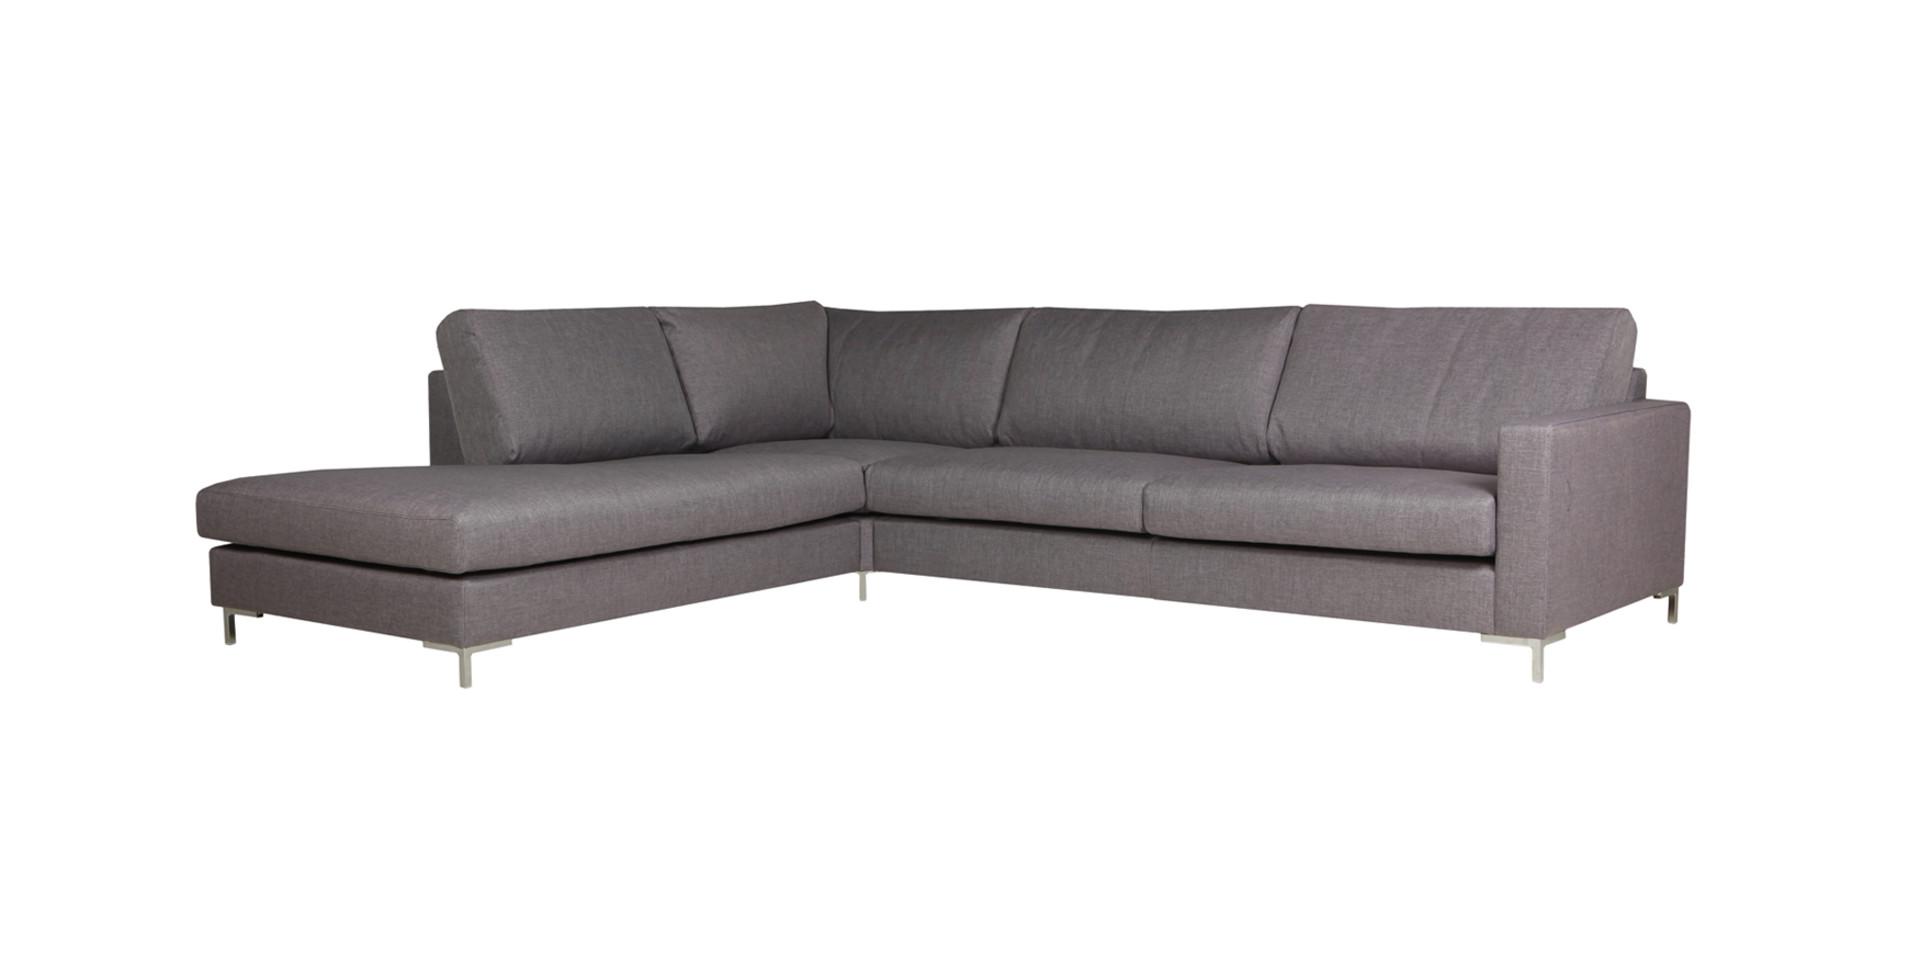 sits-quattro-angle-set14_das67_lila_2